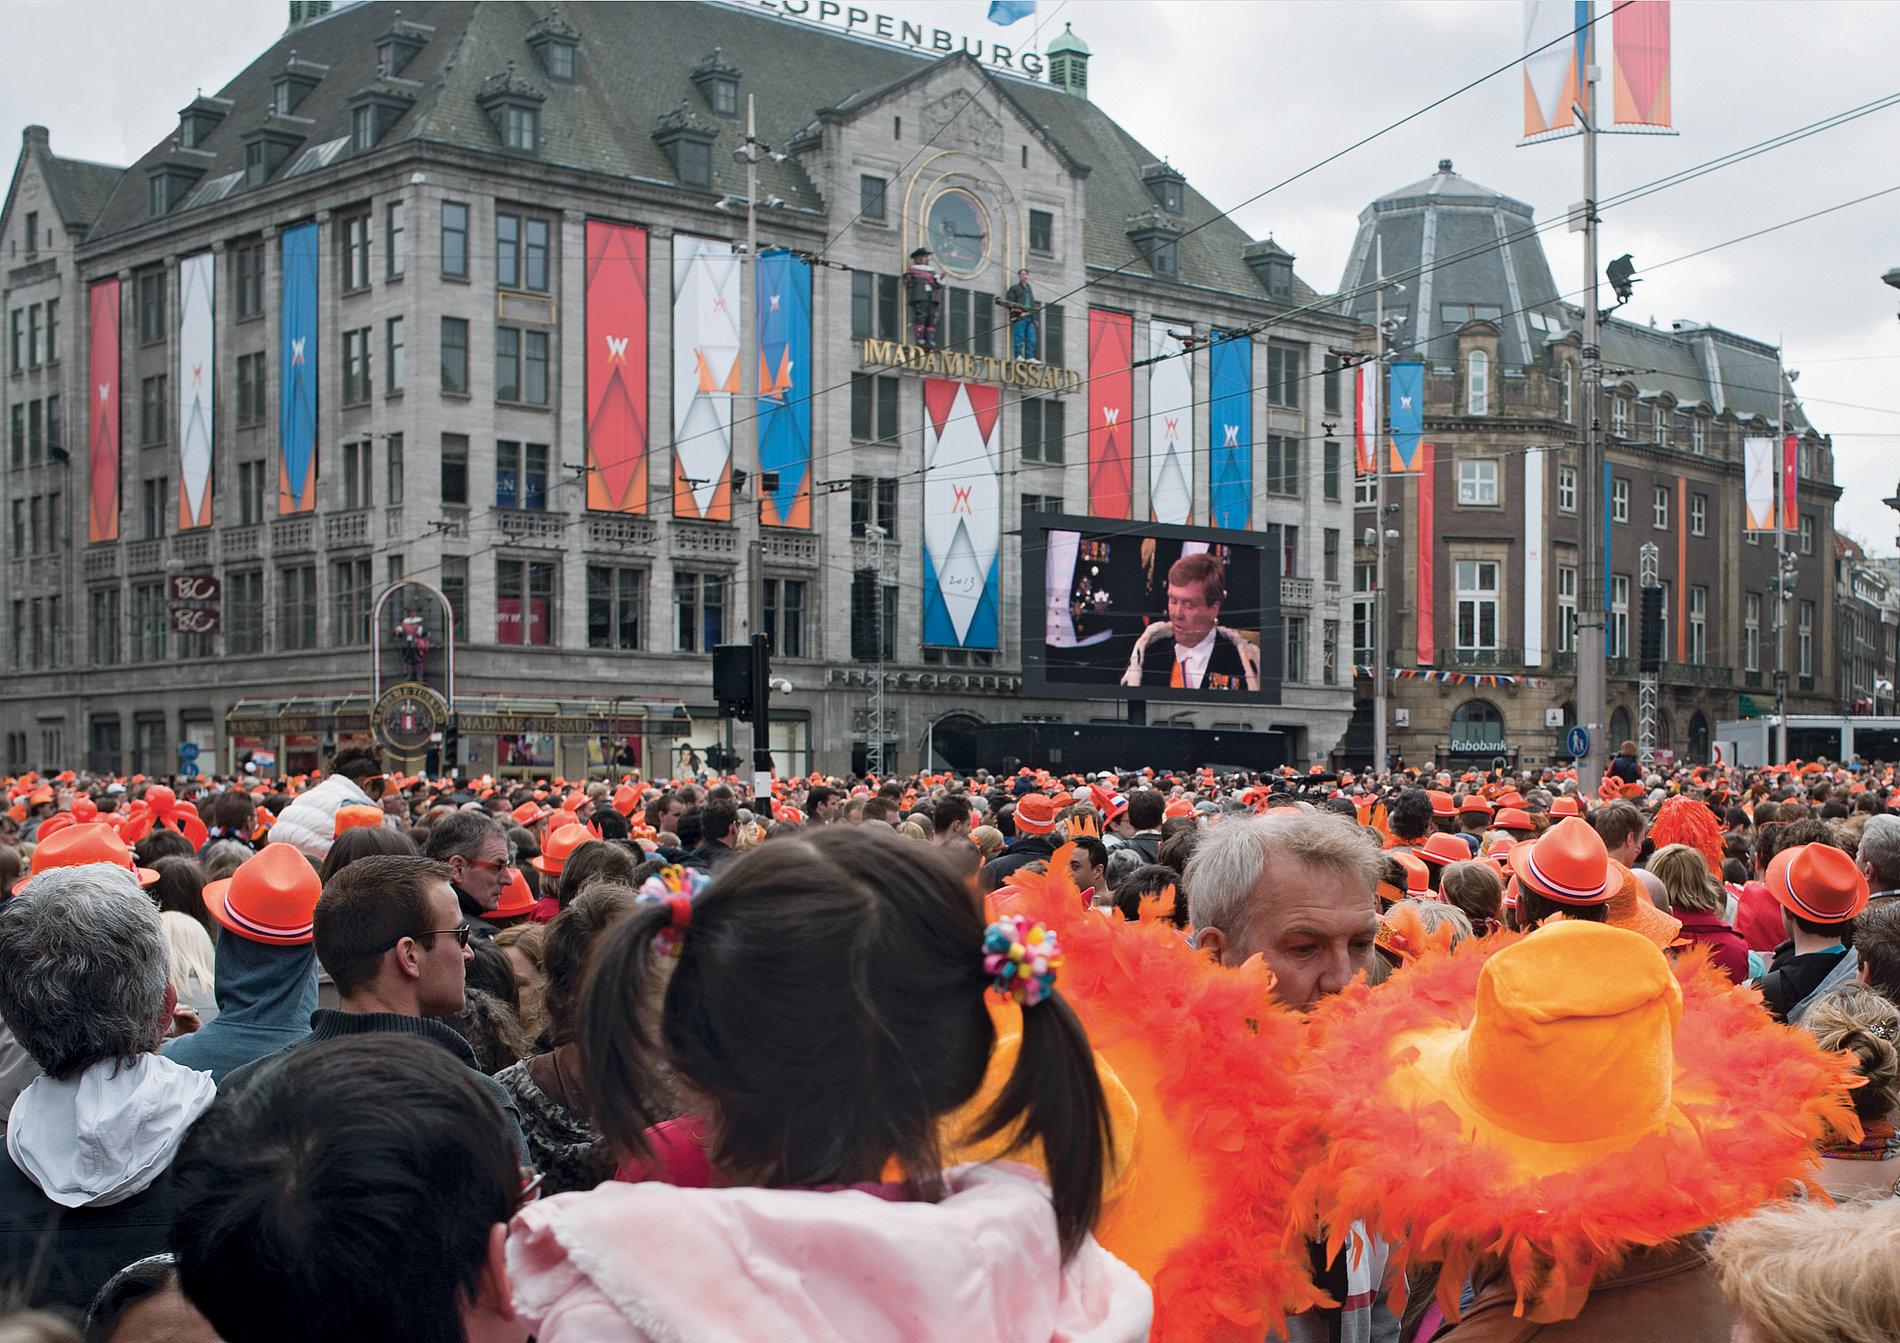 Royal Inauguration of King Willem- Alexander | Red Dot Design Award